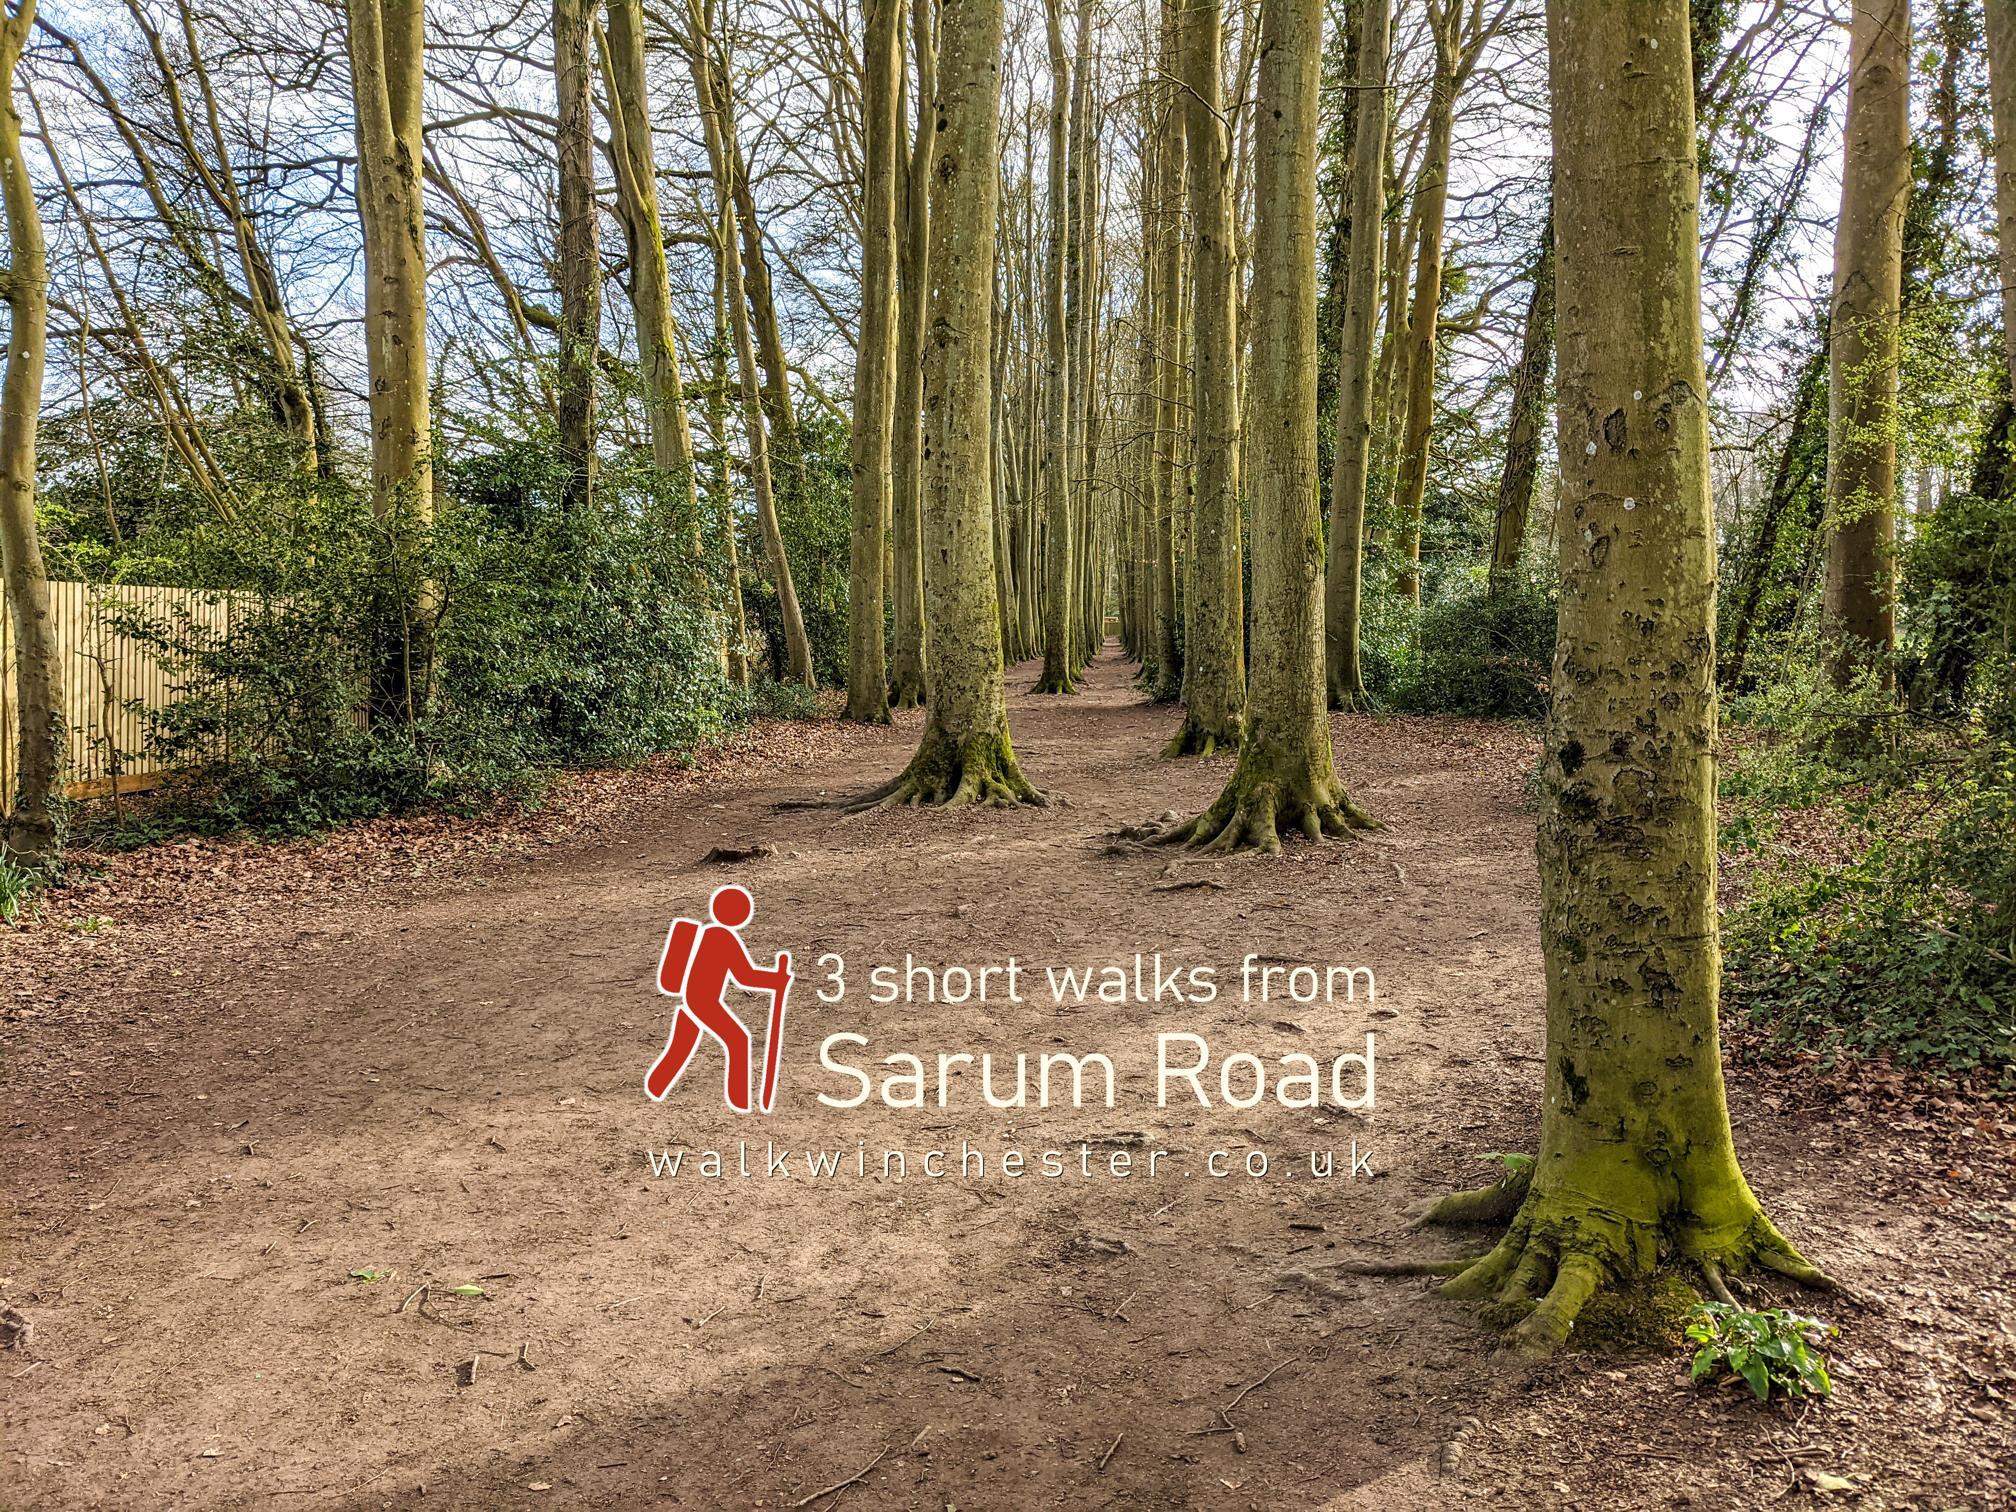 3 short walks from Sarum Road